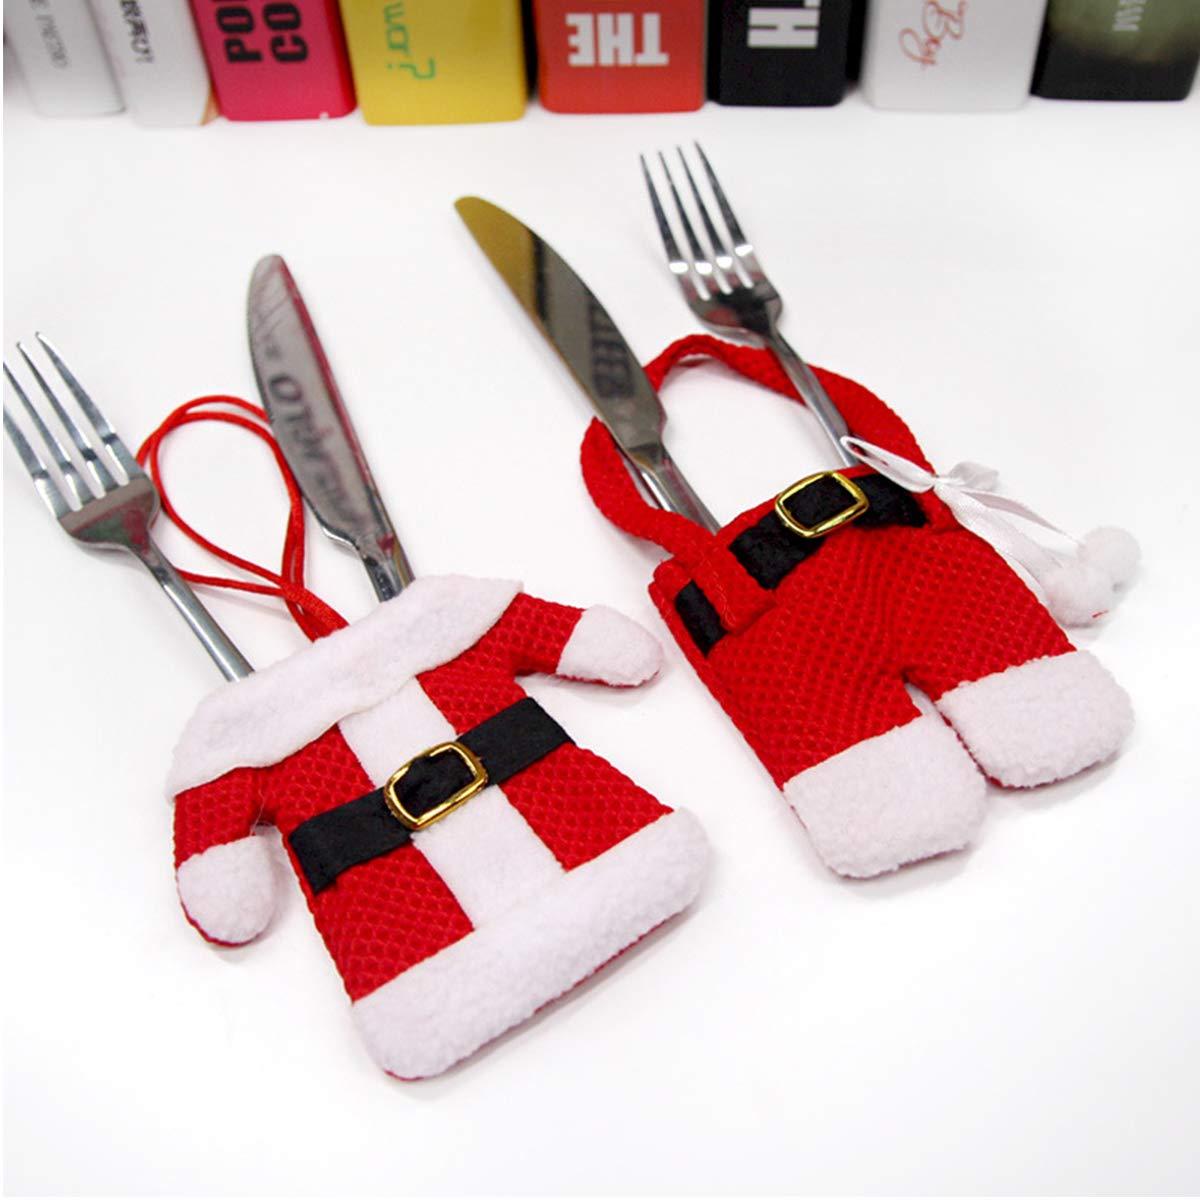 CellElection Santa Suit Christmas Silverware Holder Pockets Red, 6PCS